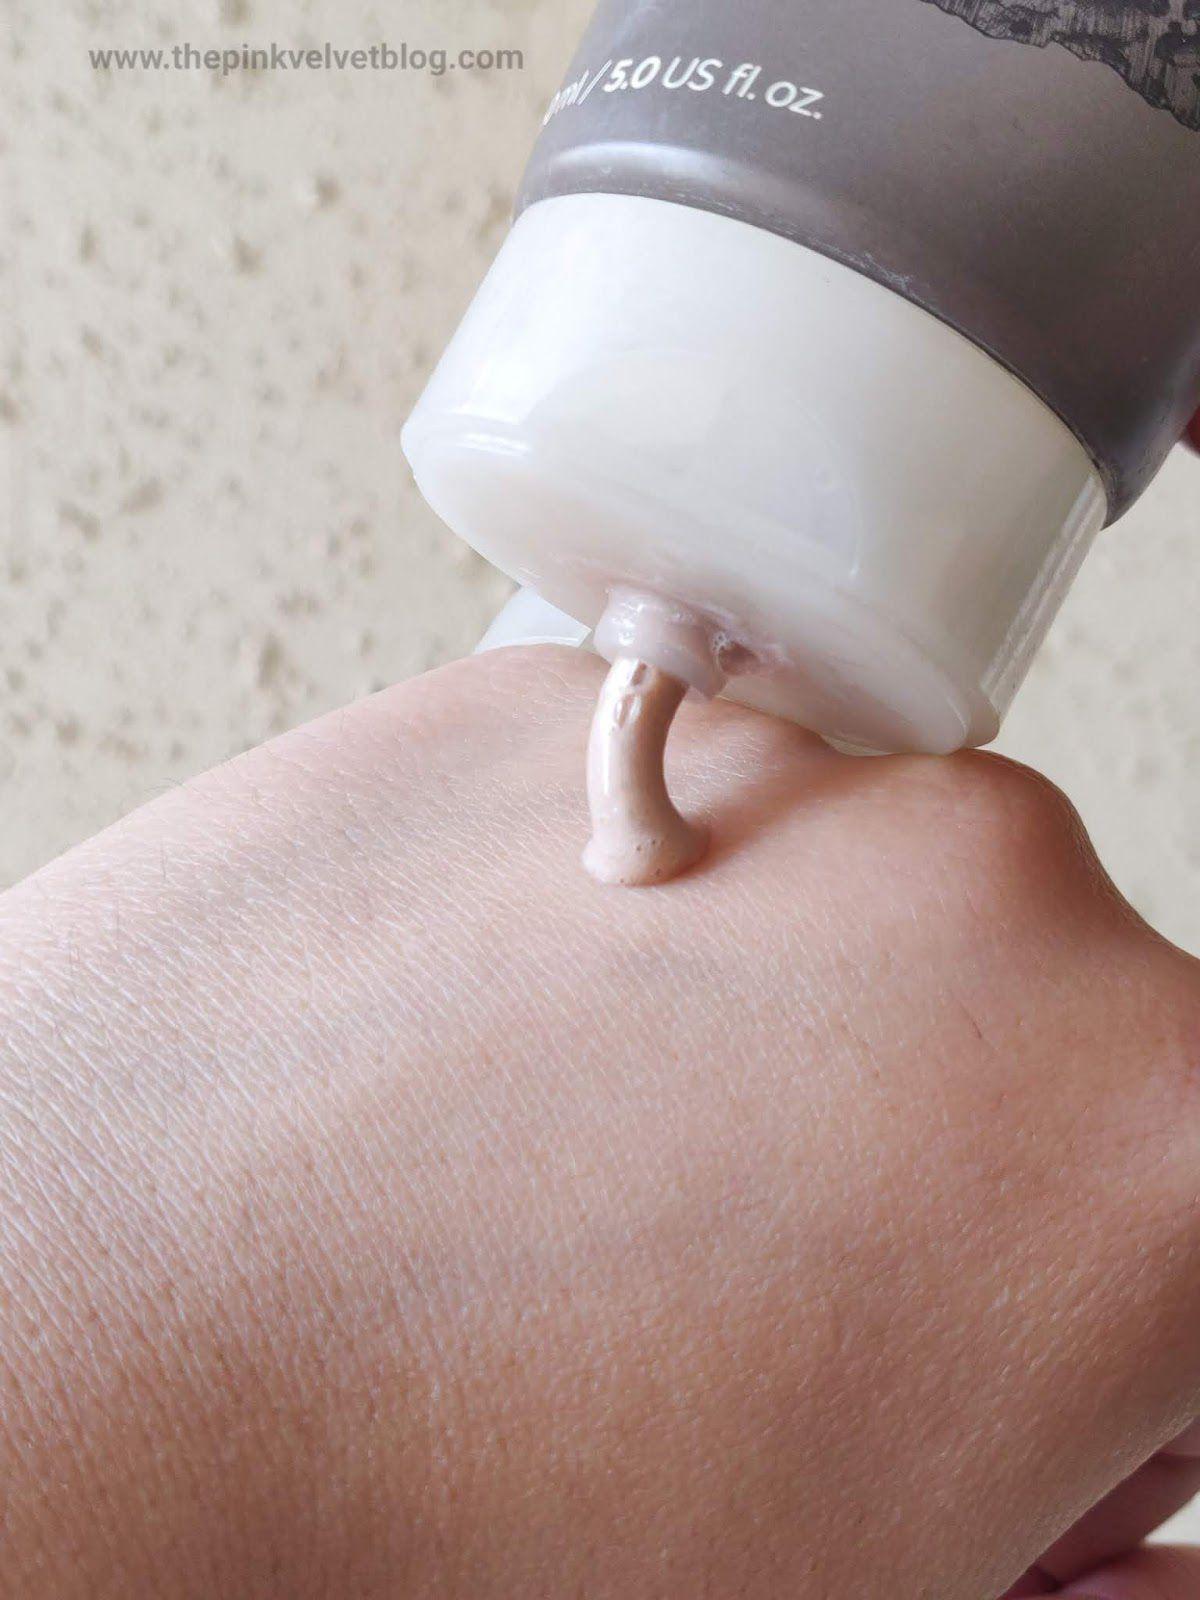 Sữa rửa mặt The Face Shop Jeju Volcanic Lava Pore Cleansing Foam có tốt không